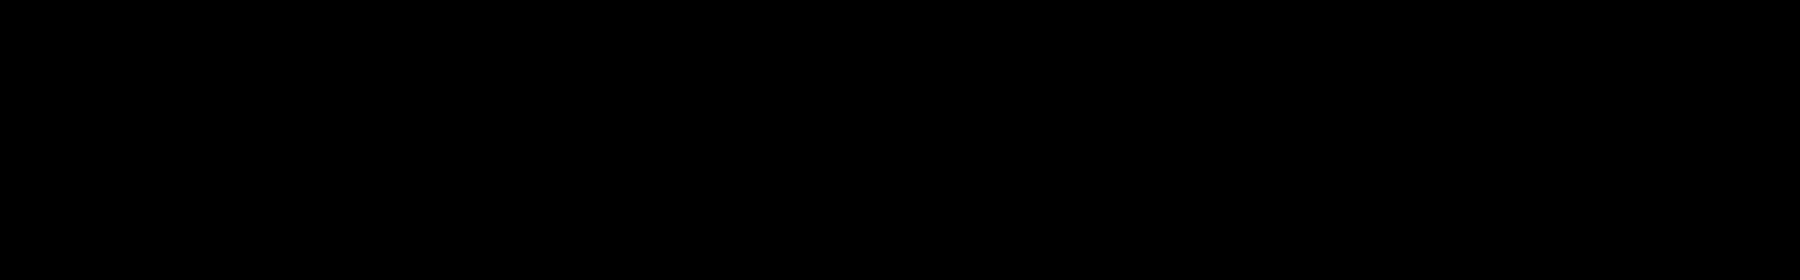 DJ-808 TR-S DRUM SAMPLE EXPANSION audio waveform